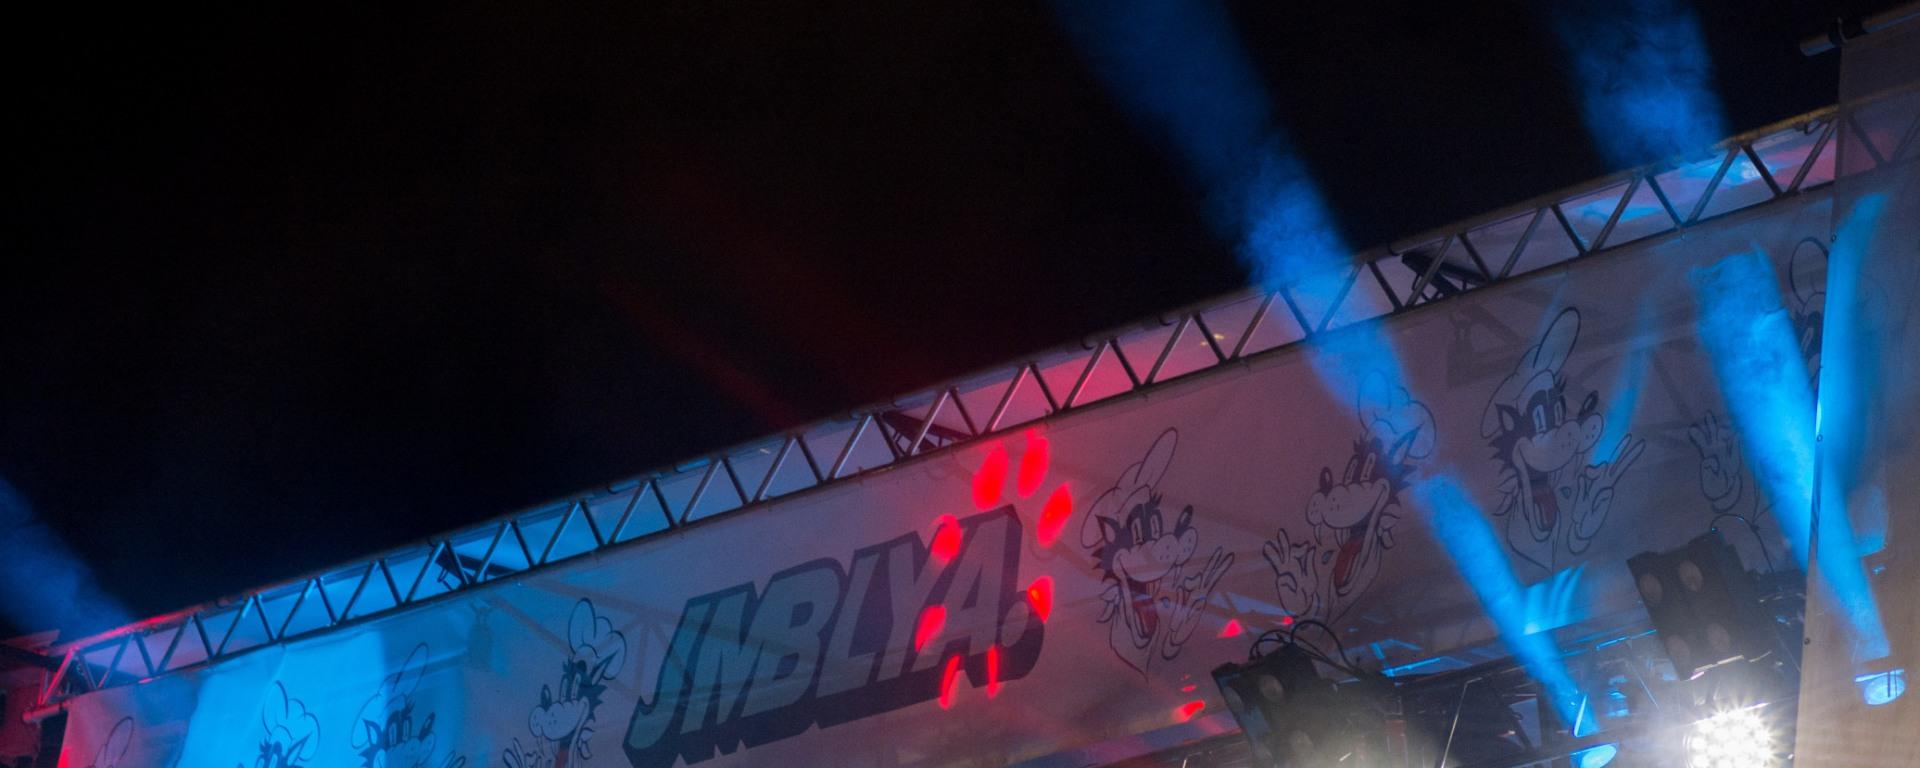 Banner for JMBLYA above a stage.